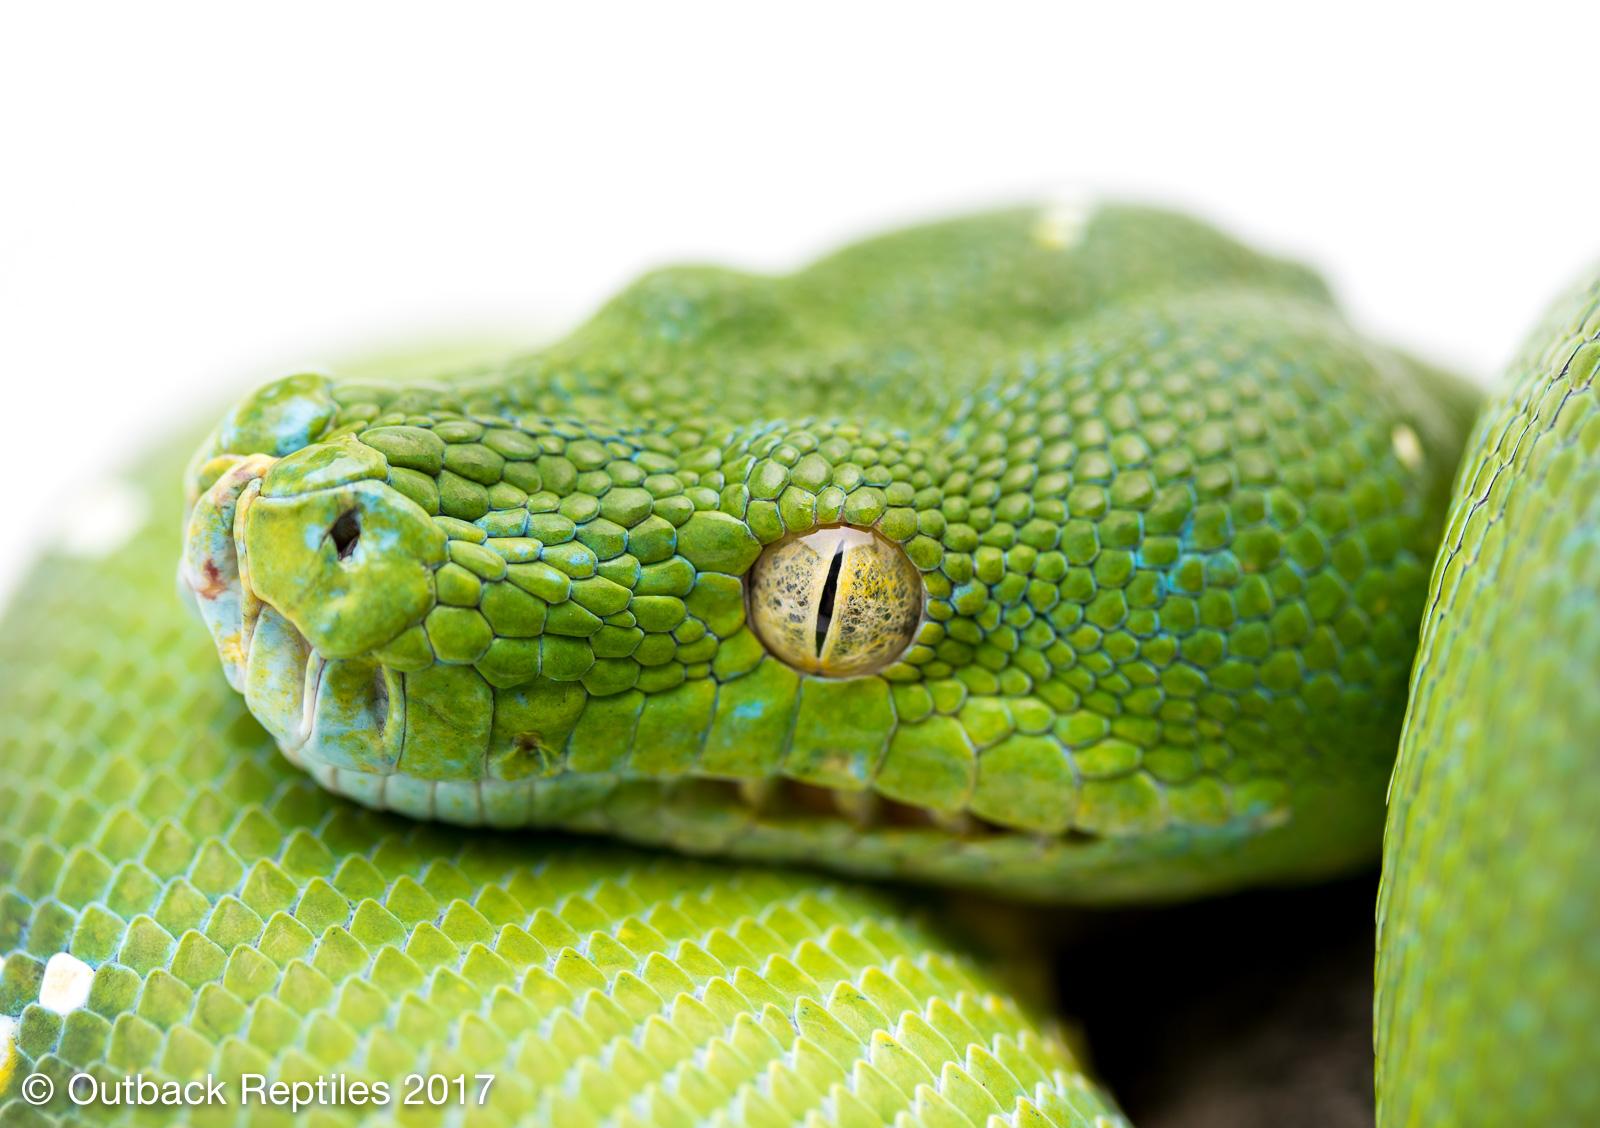 - Morelia viridis